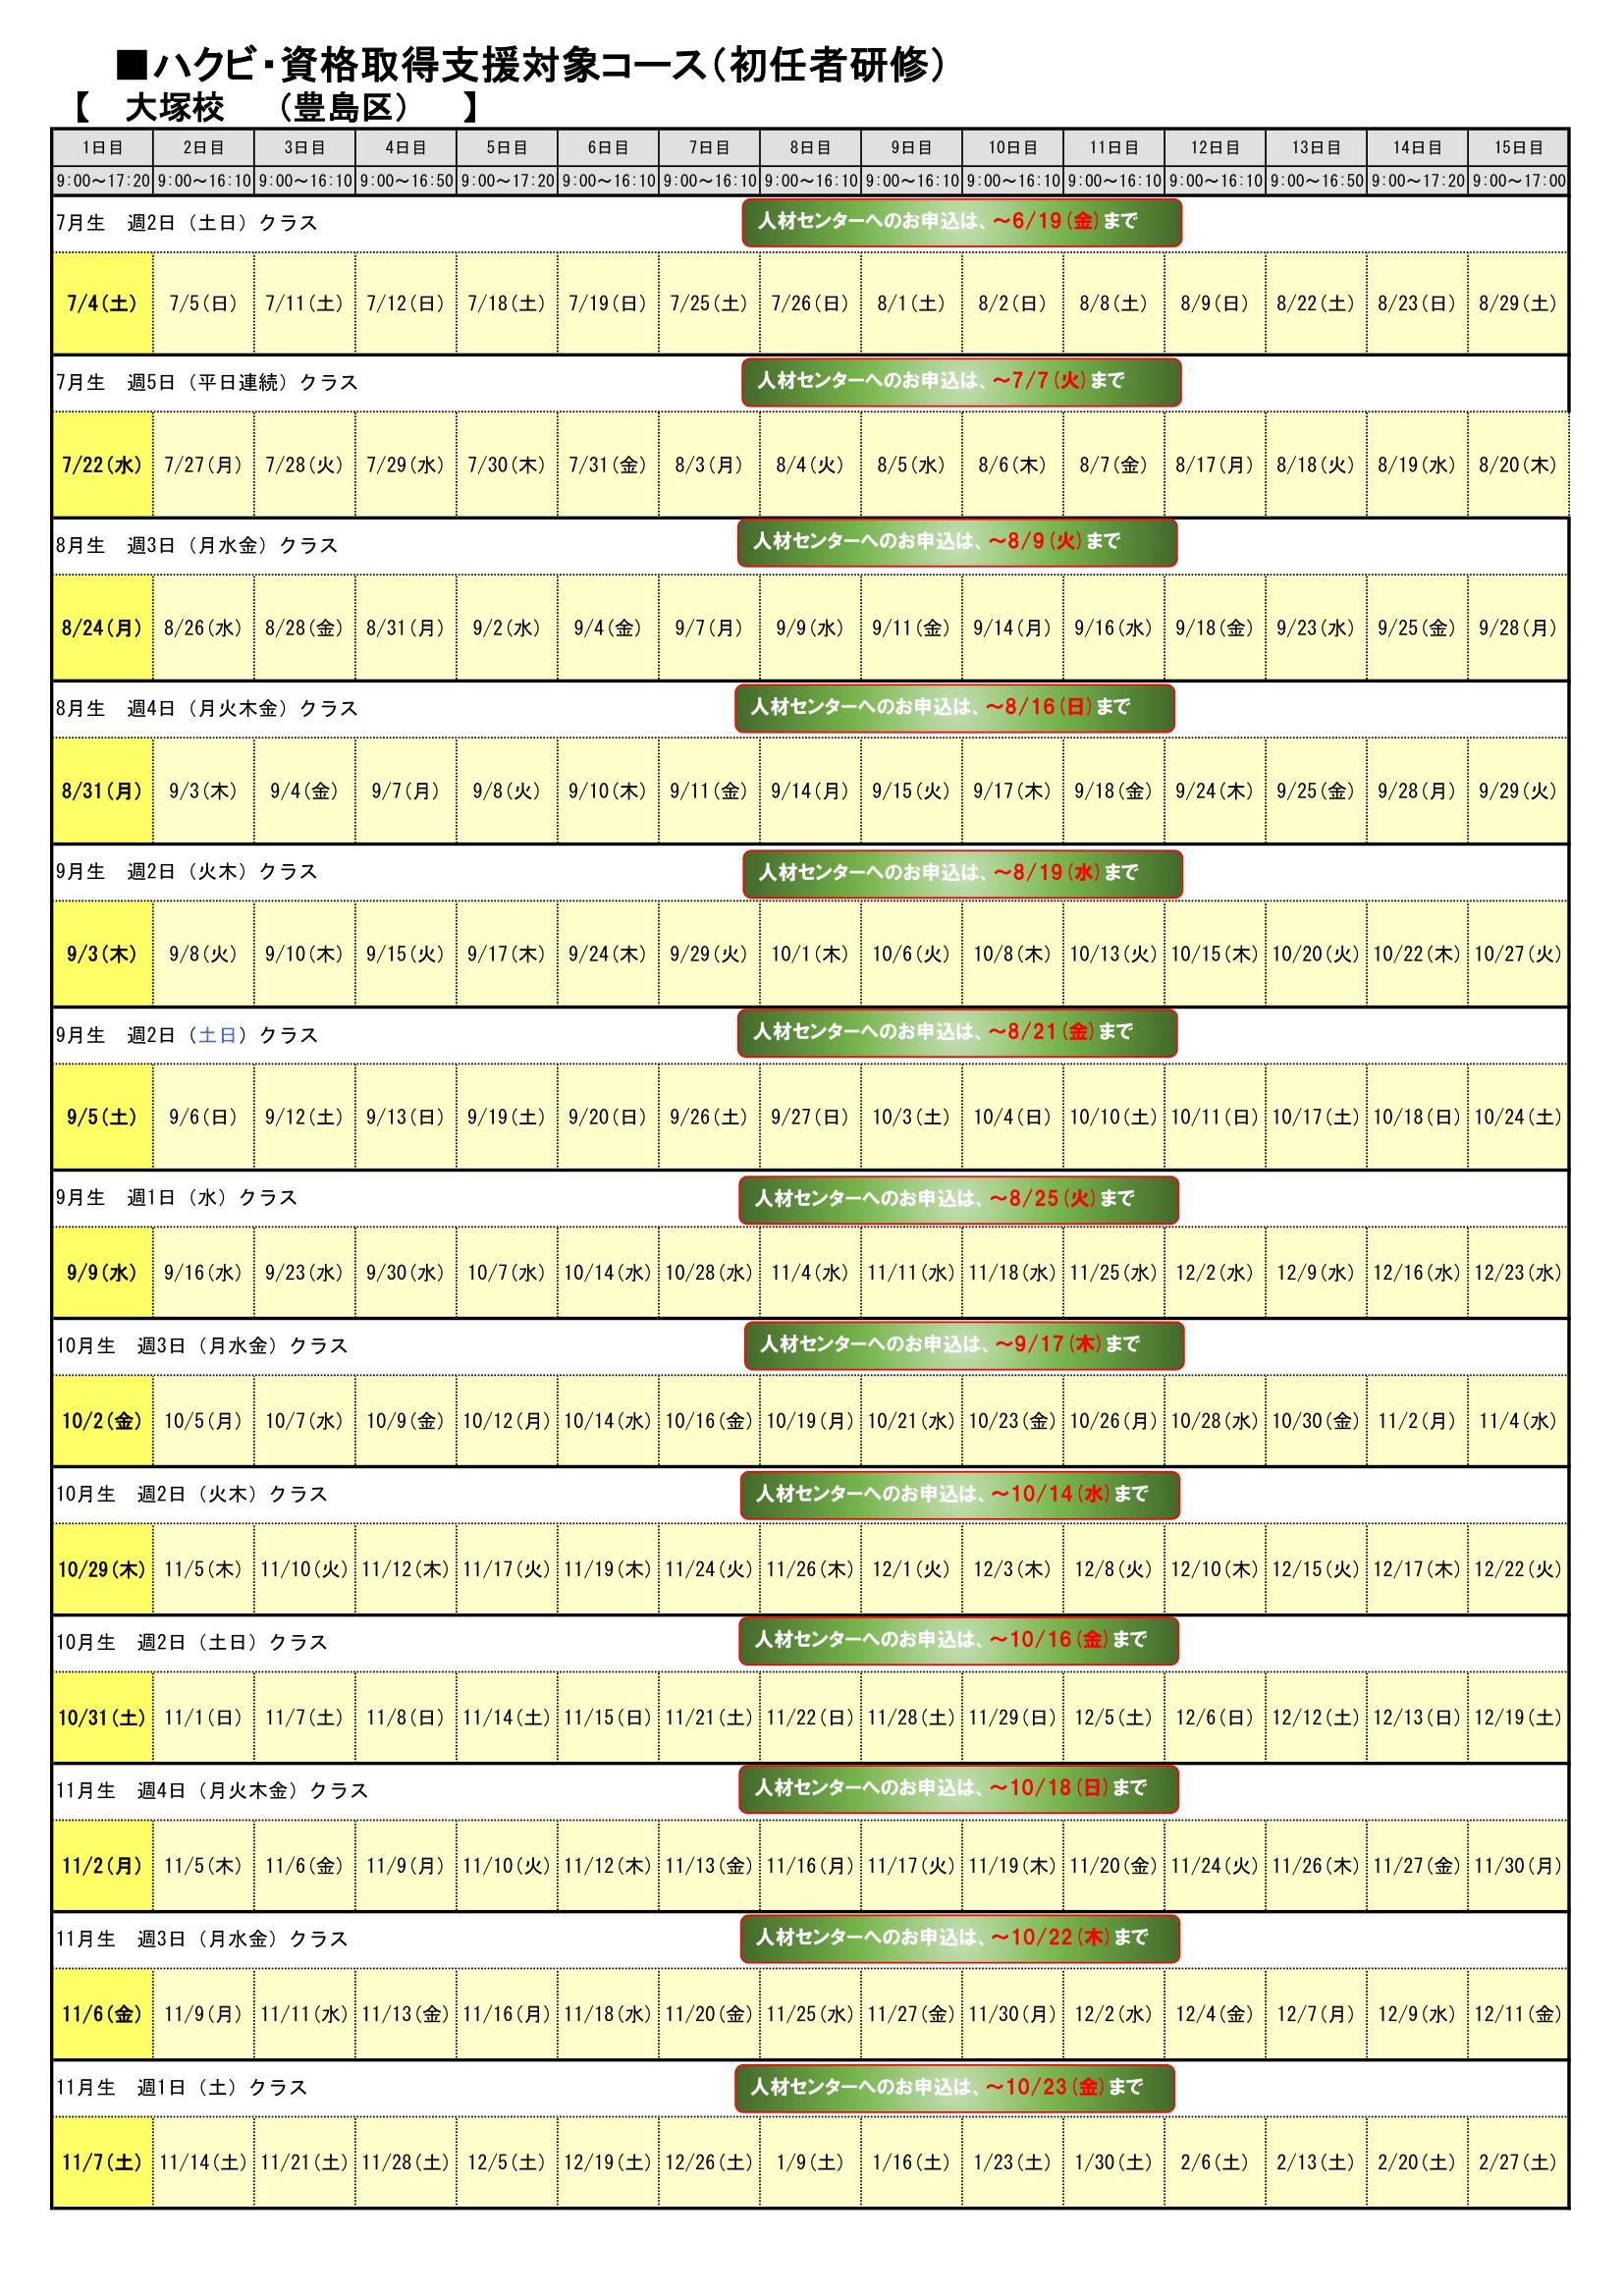 雉・シ蜿門セ玲髪謠エ2020縲€・匁椢-3